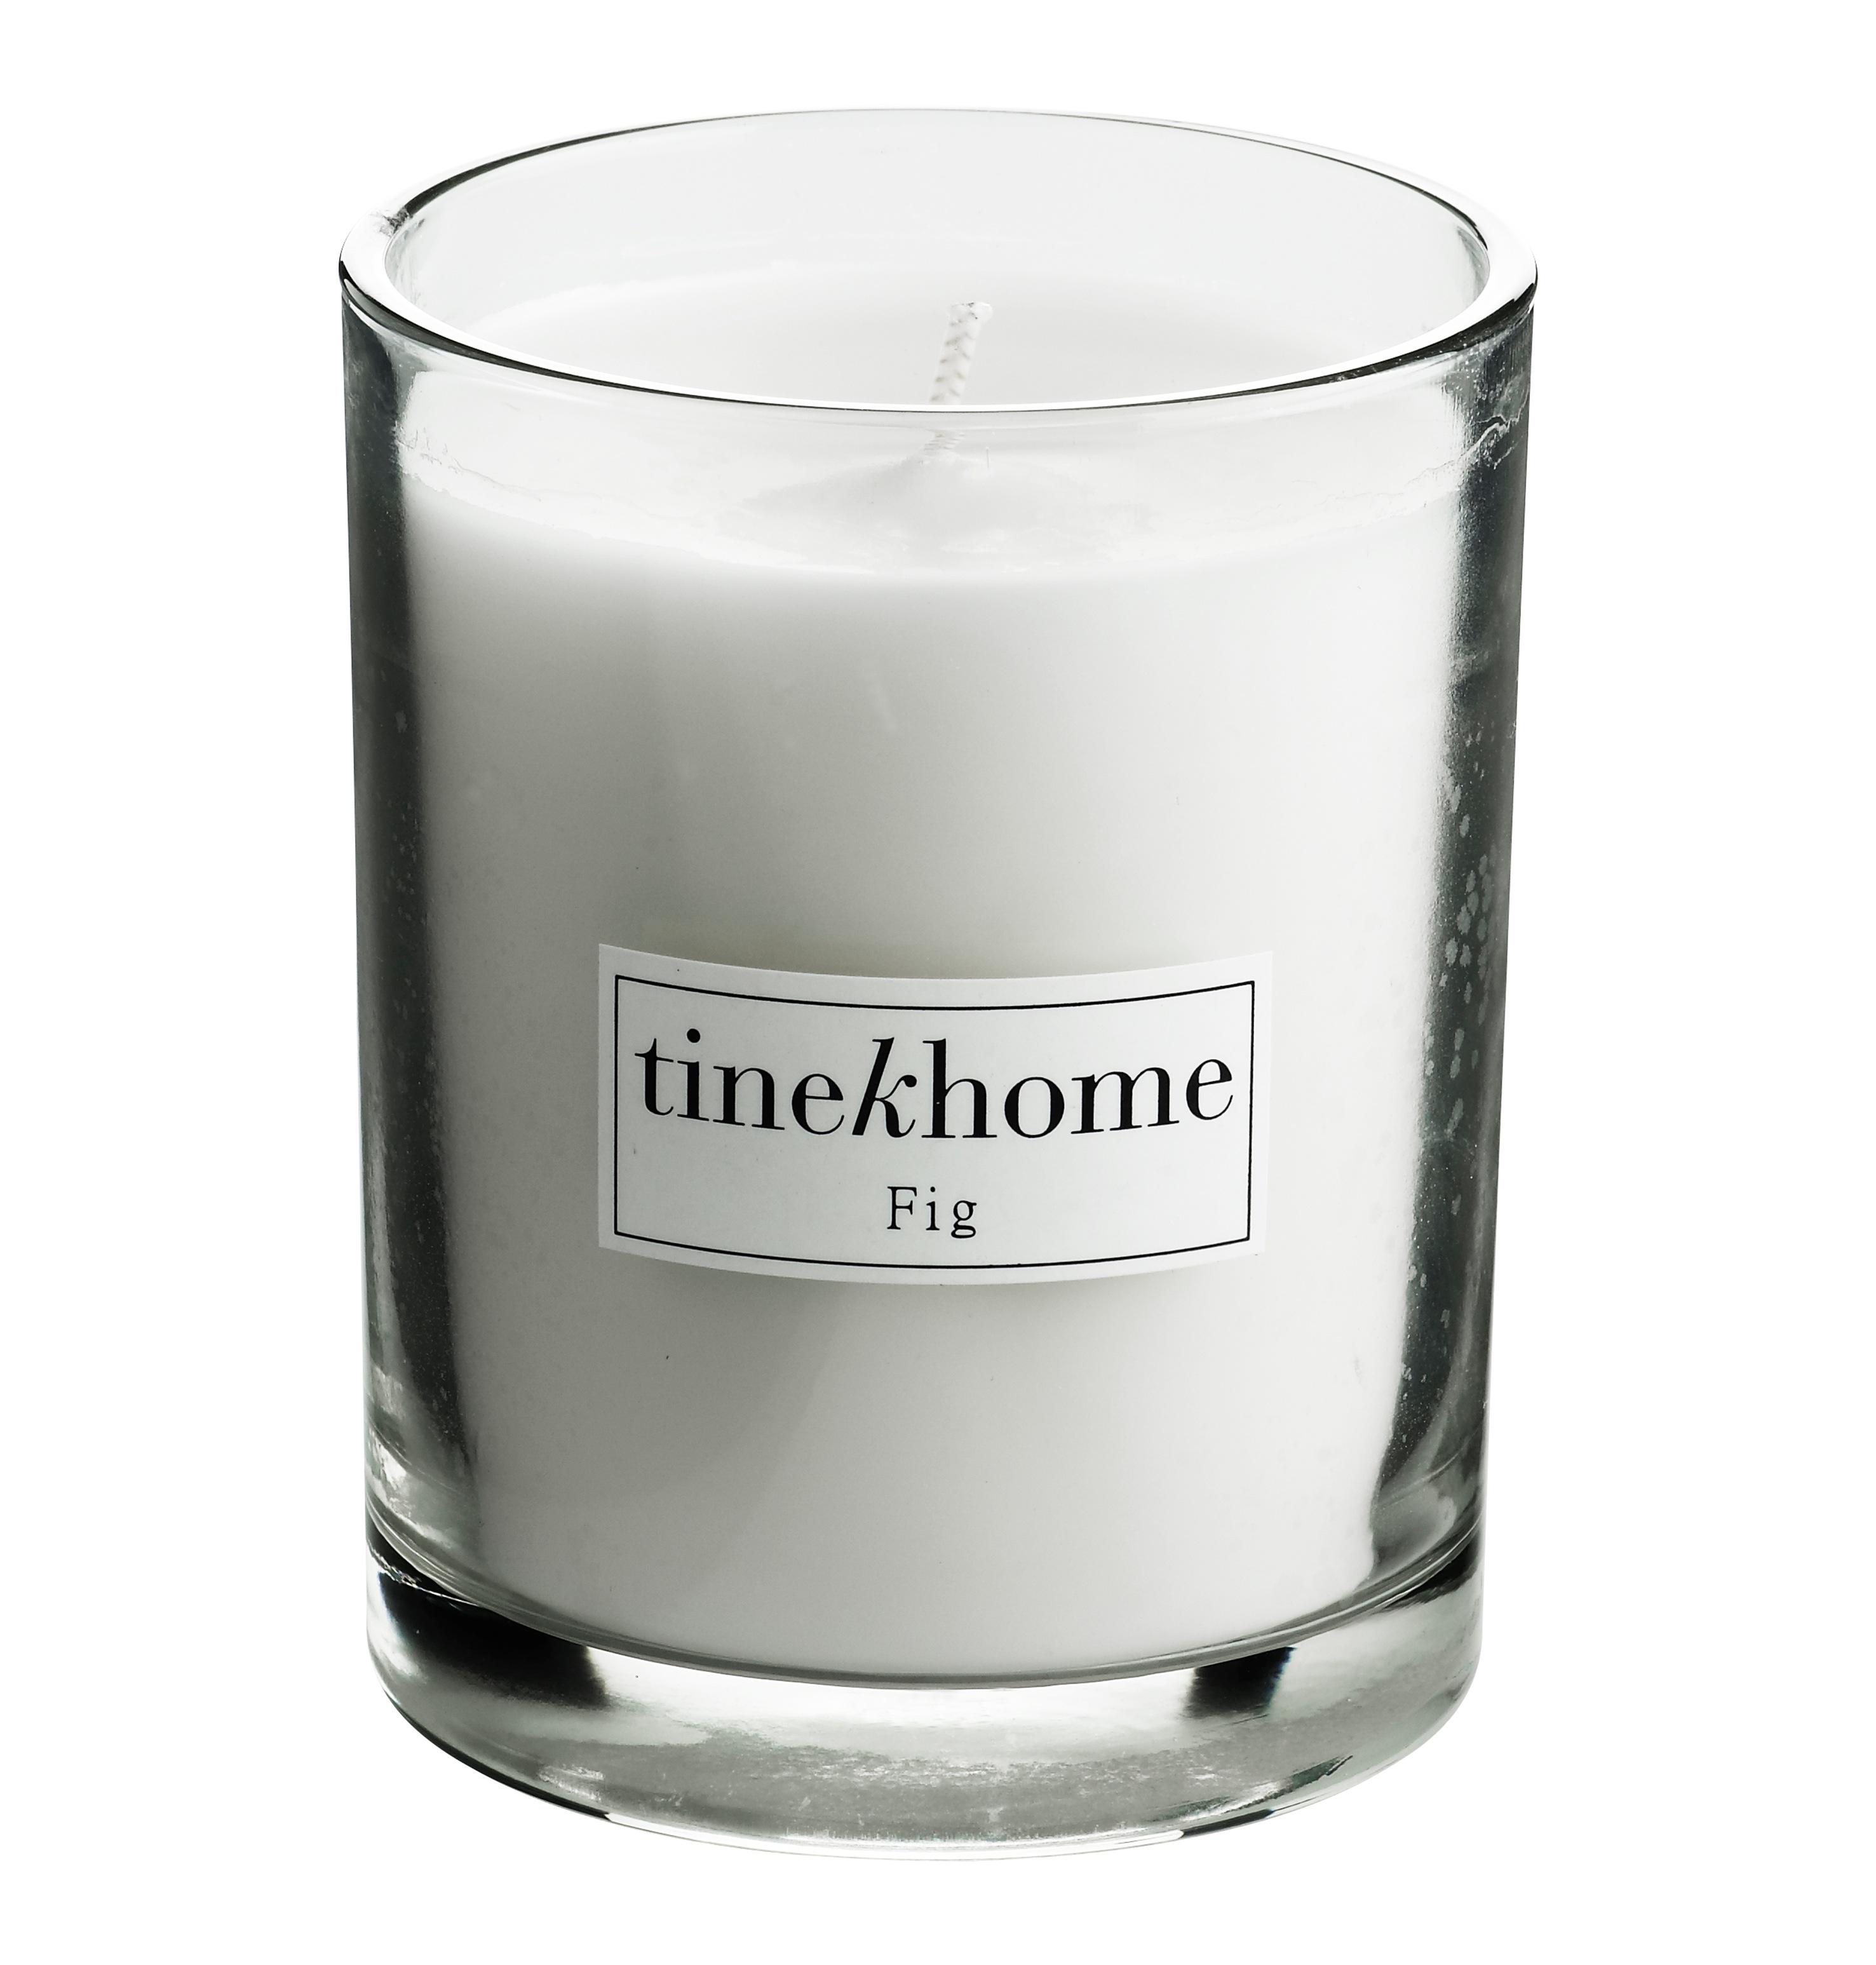 TINE K HOME SCENTL-FIG